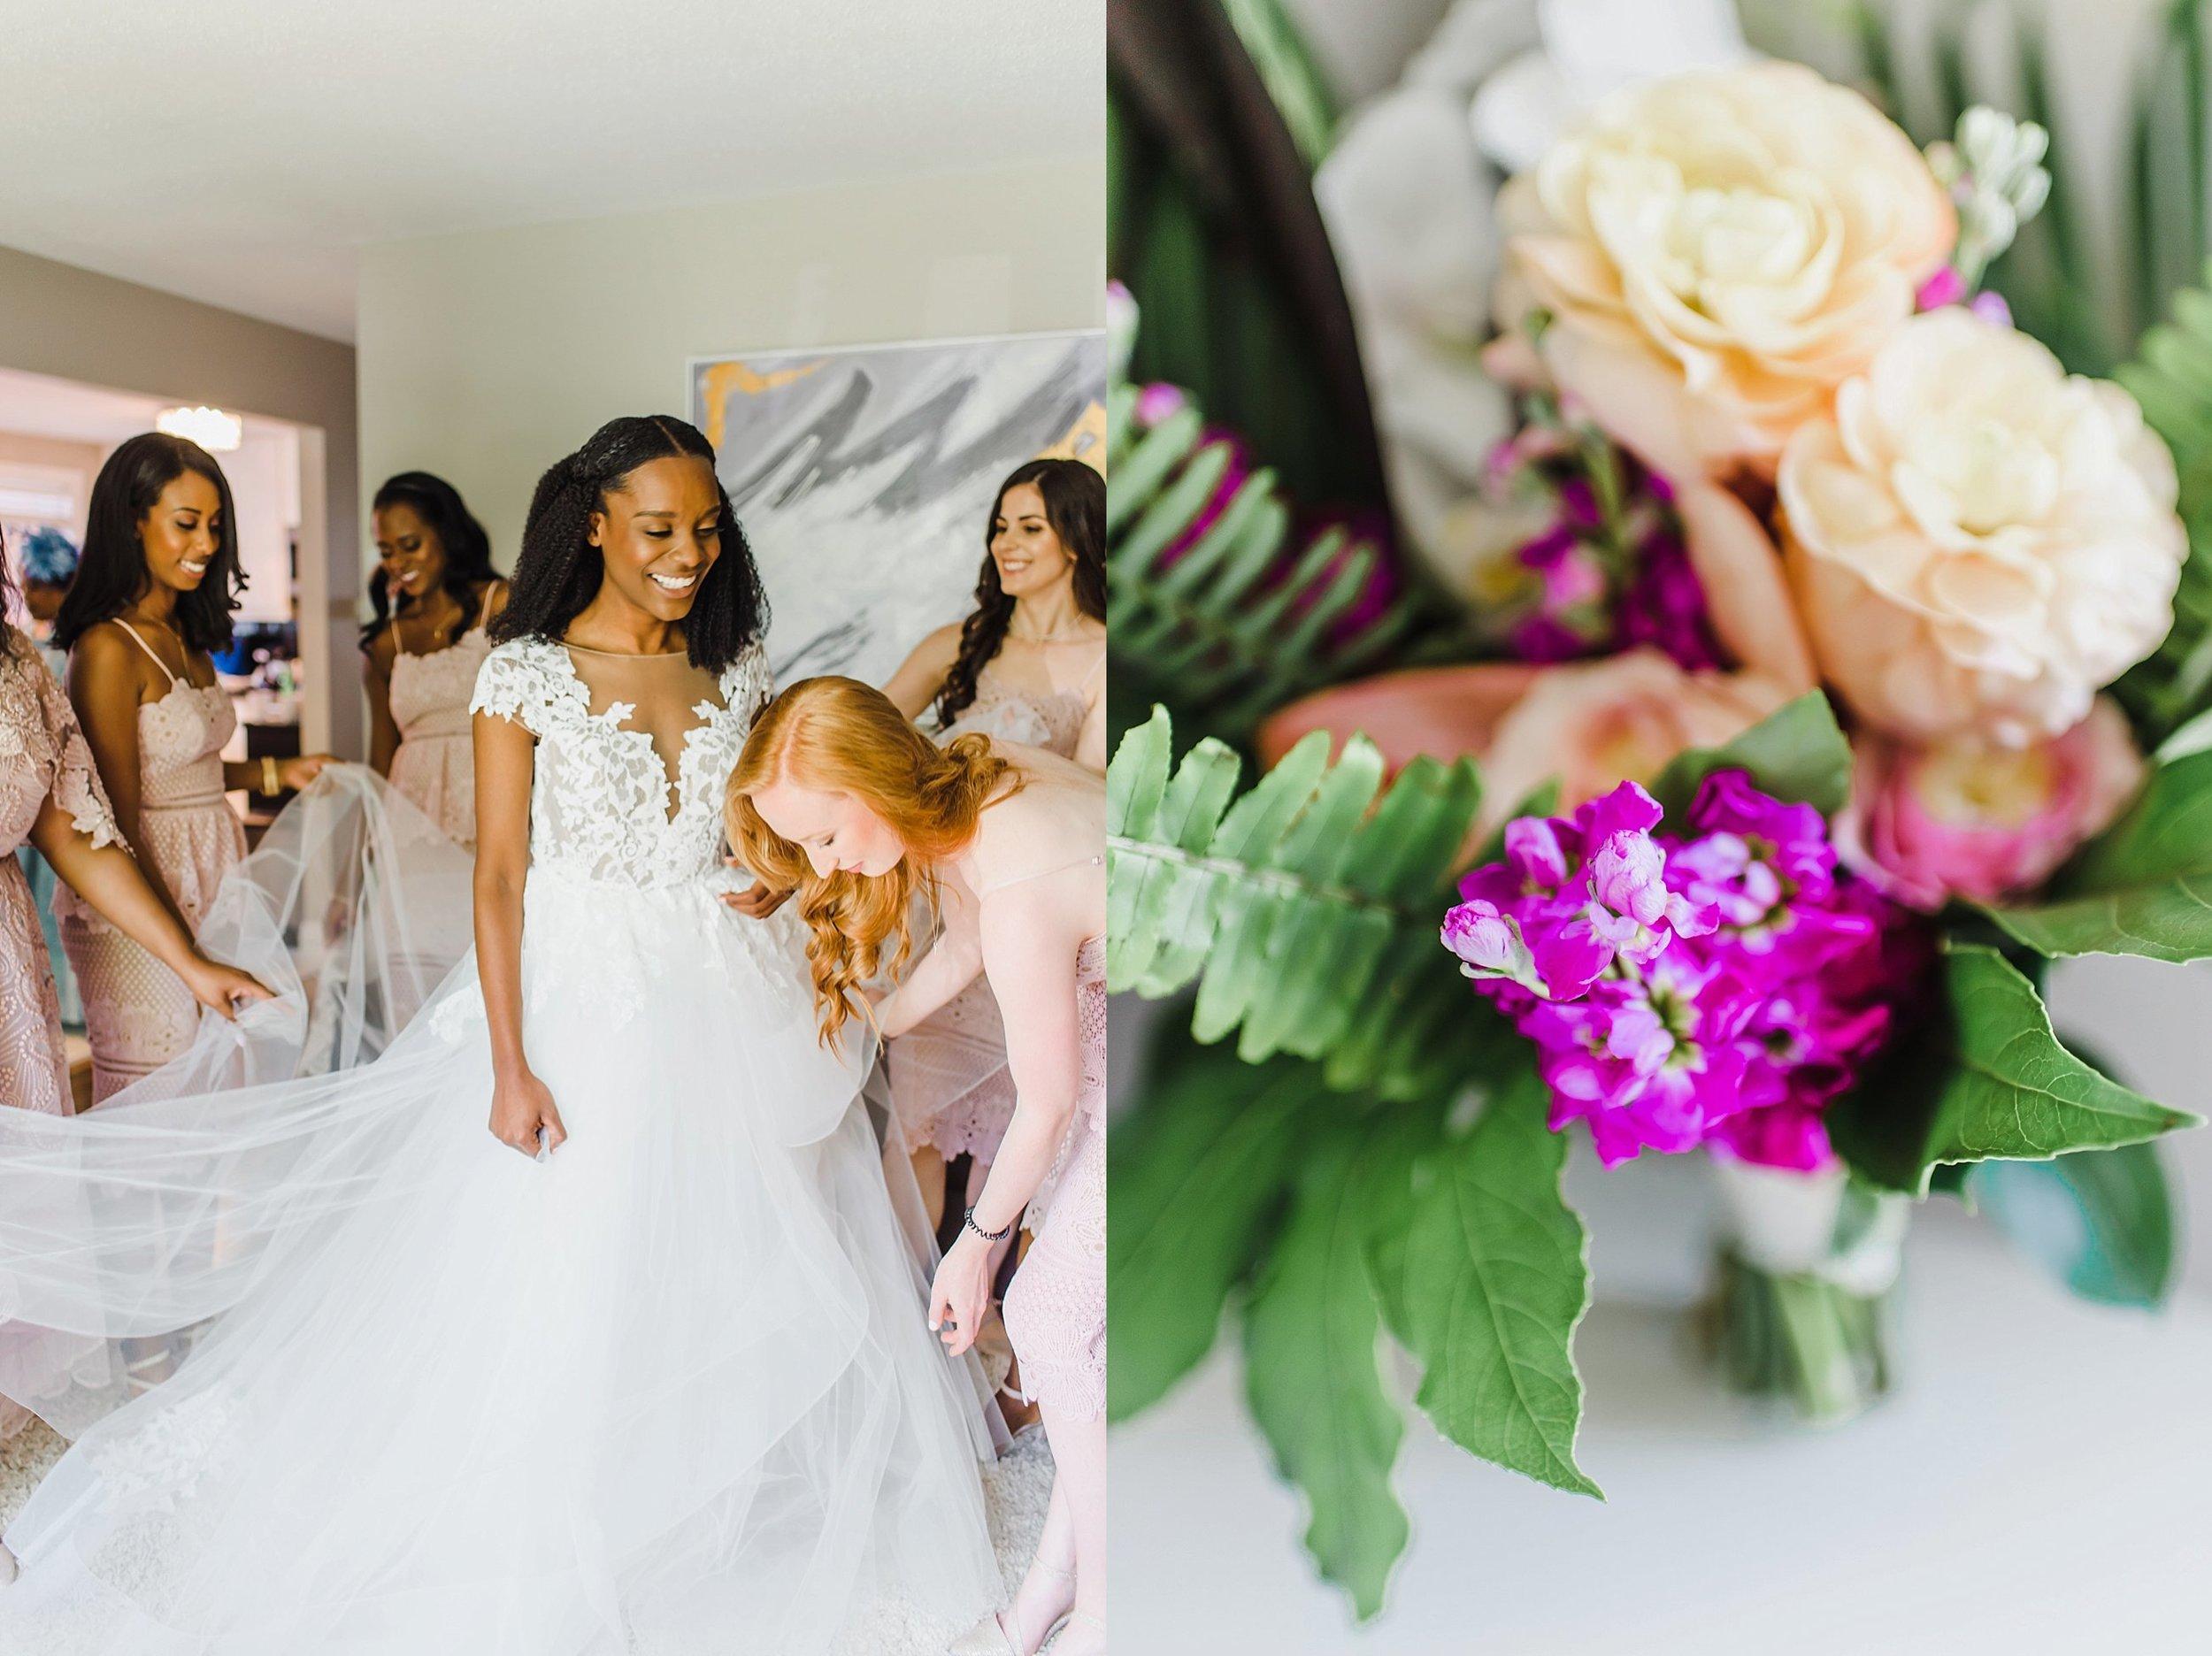 light airy indie fine art ottawa wedding photographer | Ali and Batoul Photography_0951.jpg